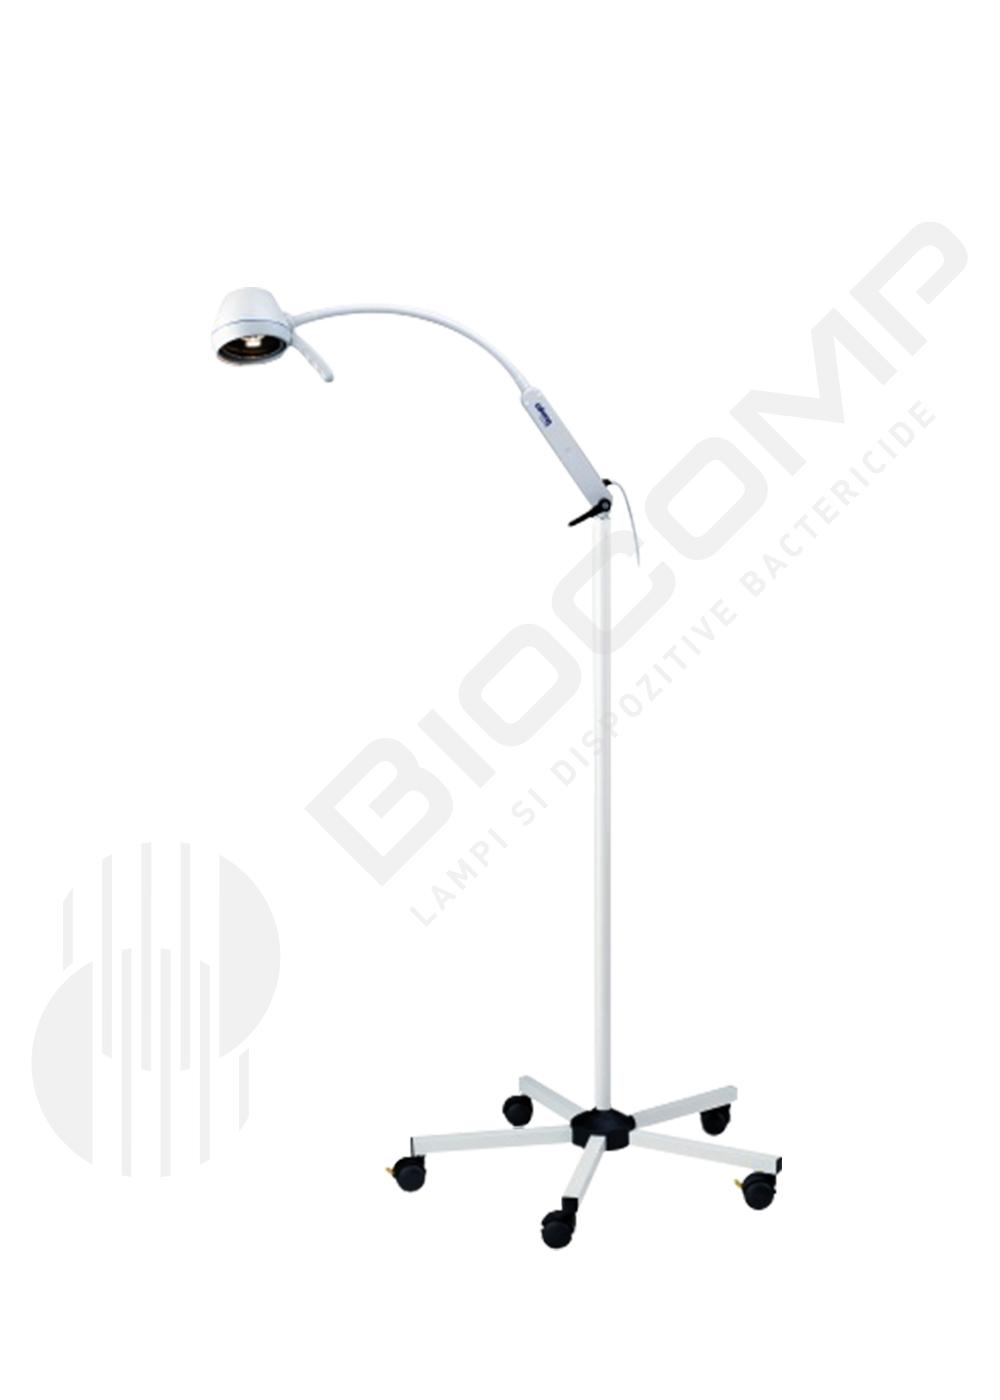 Lampa de examinare cu halogen, brat flexibil si montare pe stativ mobil